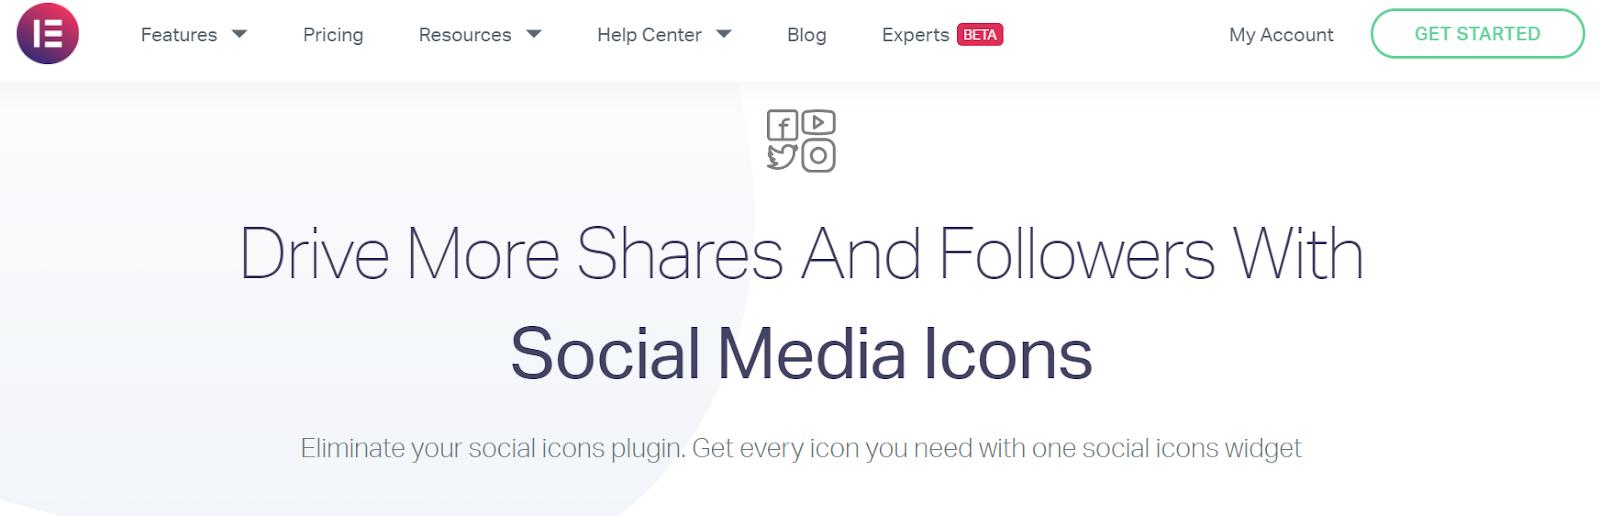 Elementor features social media